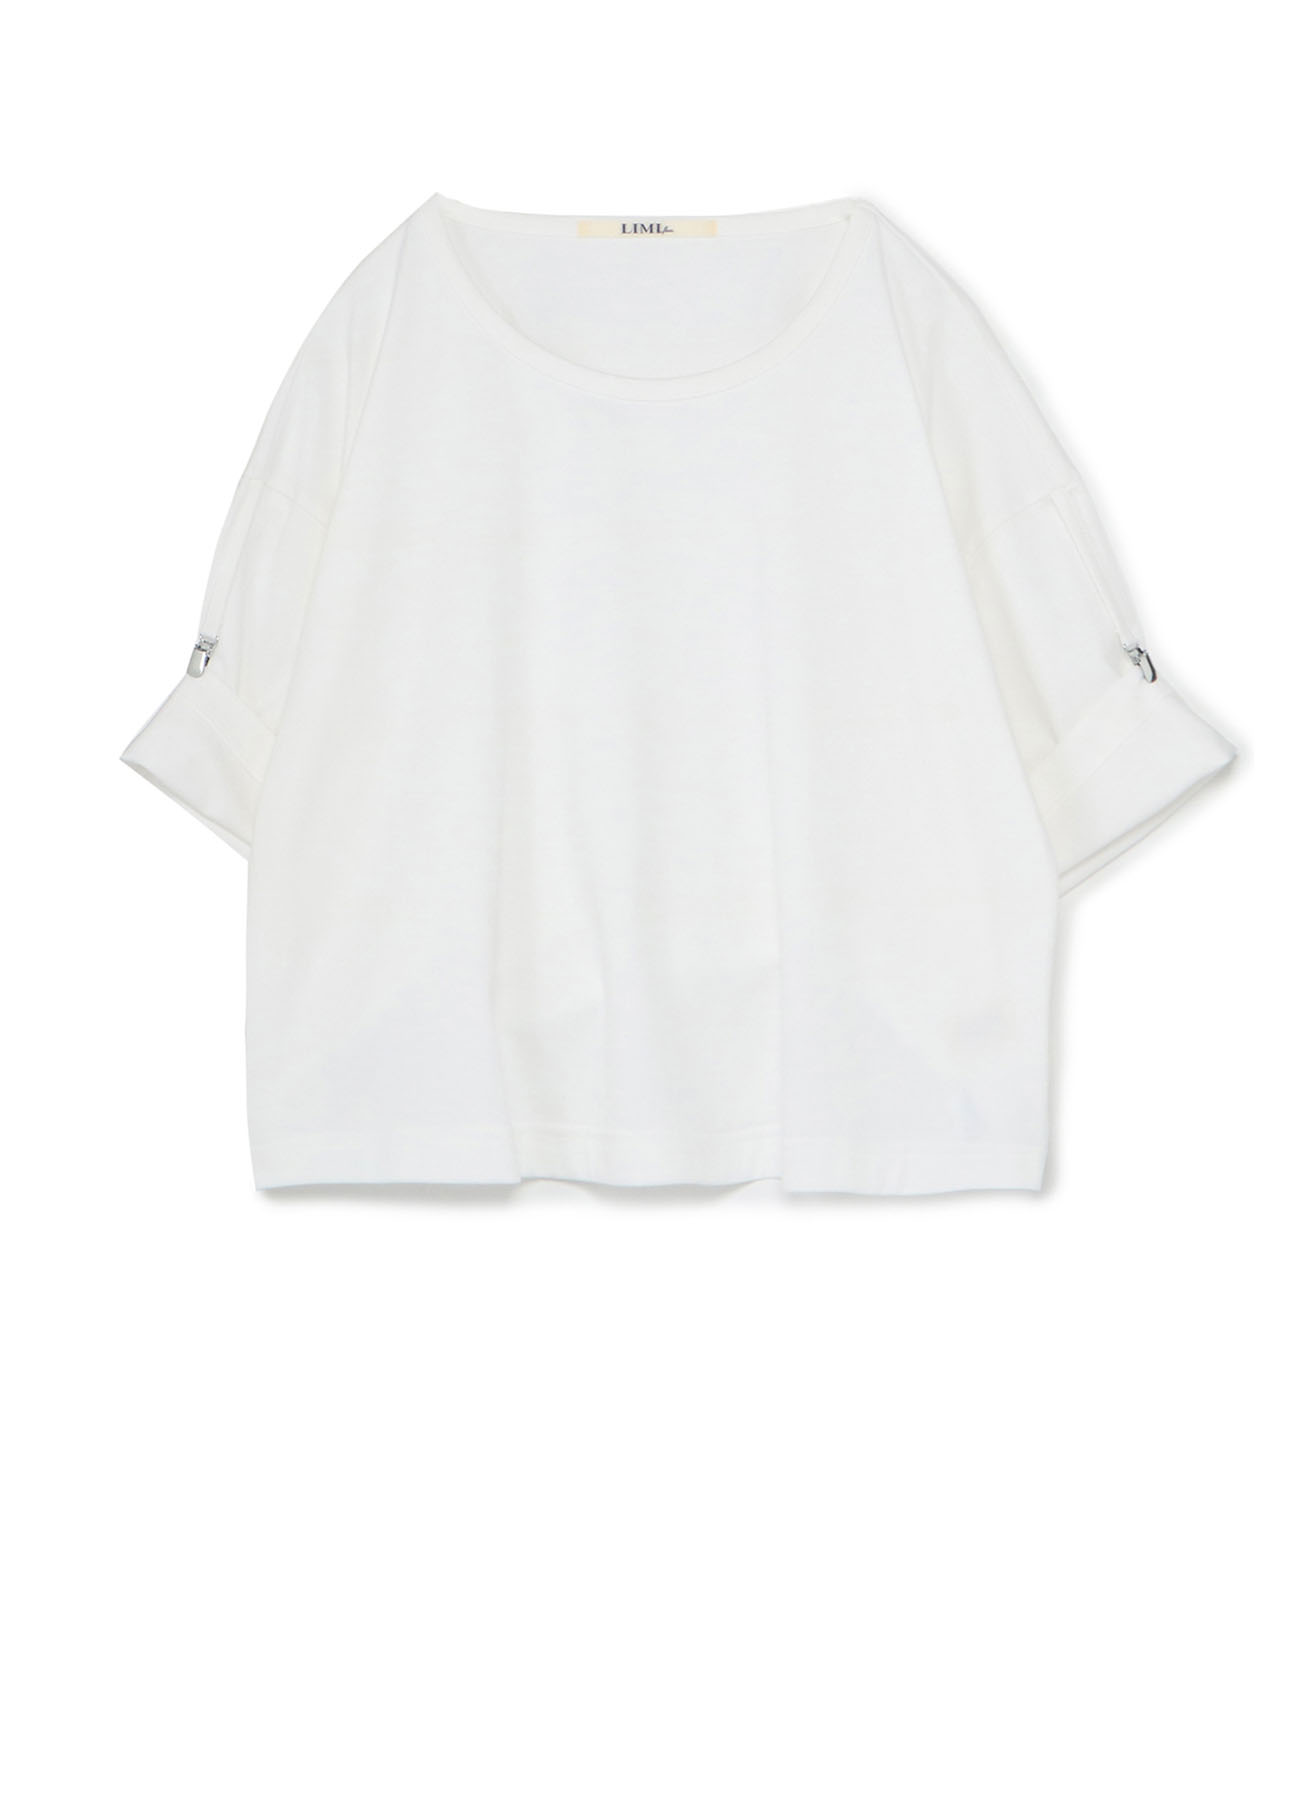 40/2 Cotton Plains titch Suspender Half Sleeve T-shirt